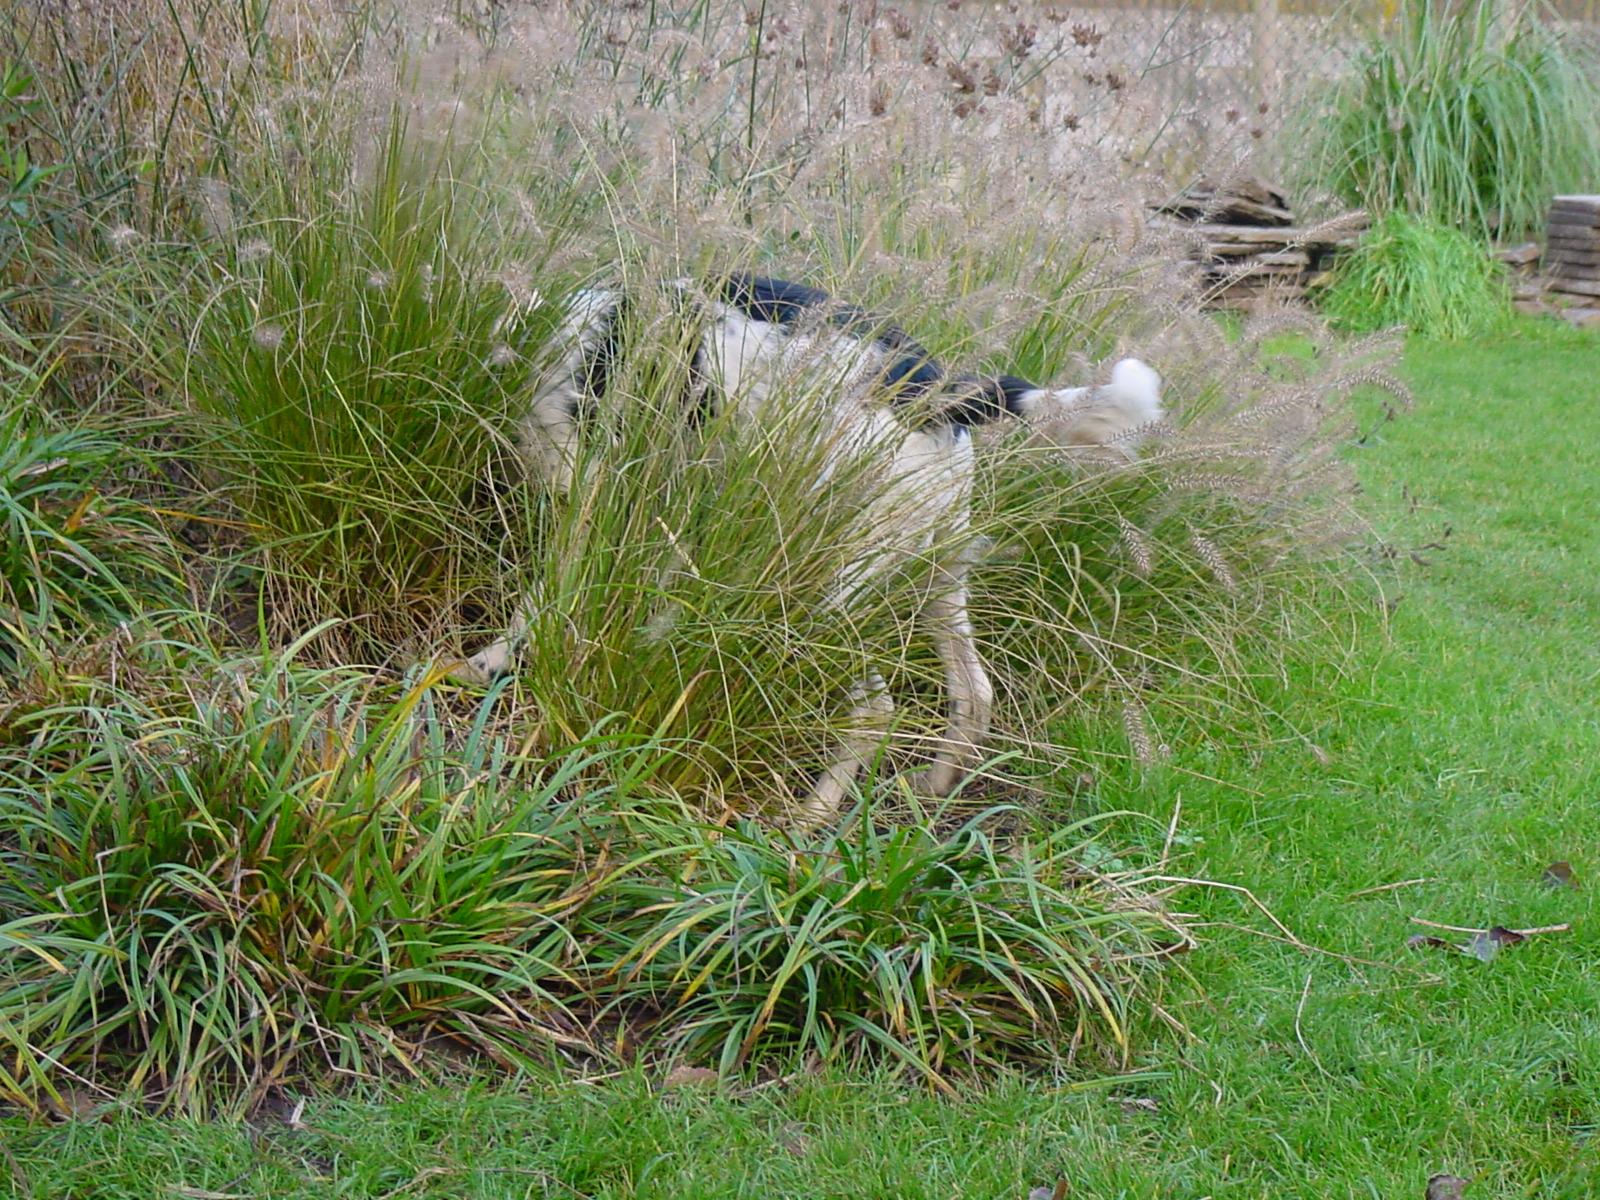 Hond Vriendelijke Tuin : Kluifjes: hondvriendelijke tuin